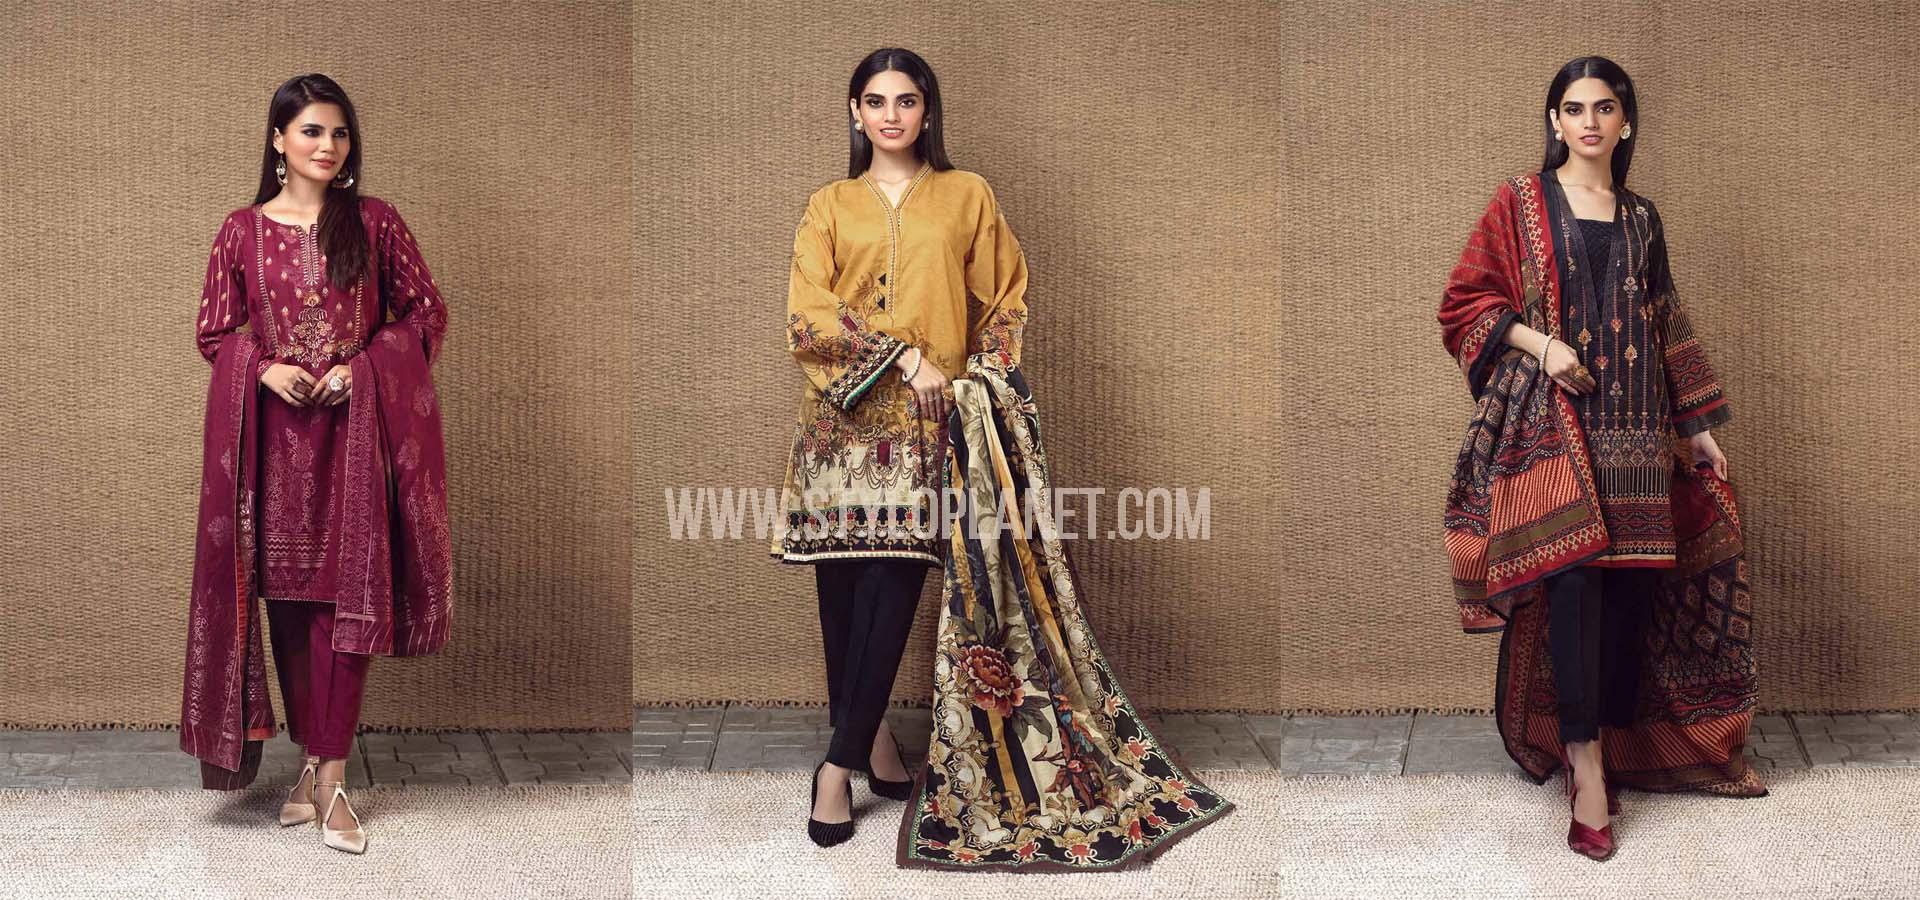 Bonanza Satrangi Latest Winter Khaddar Collection 2020